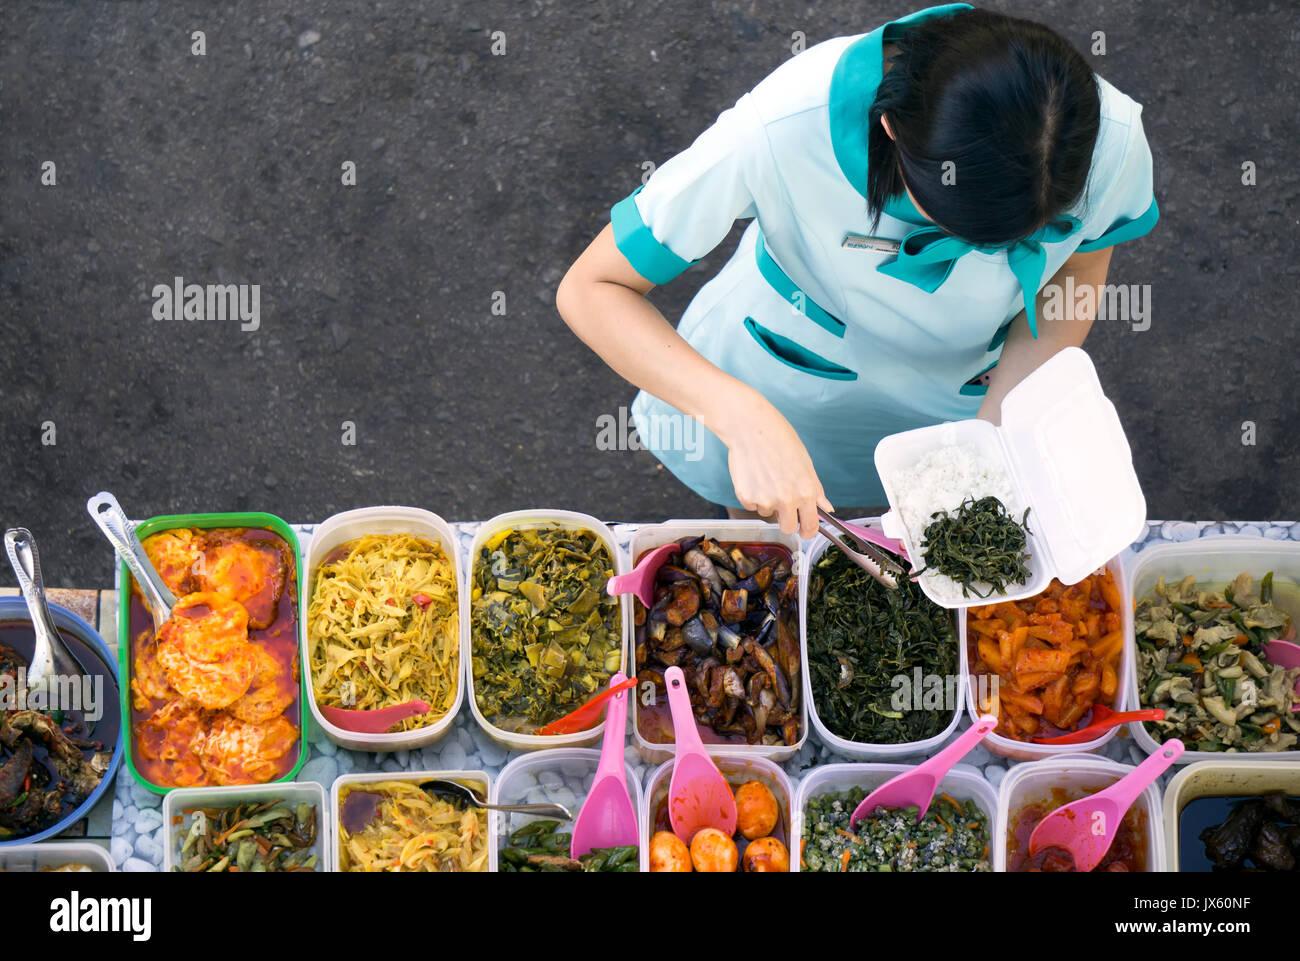 Kota Kinabalu, Malaysia - August 1, 2017: Directly above shot of a woman choosing a food at the self service street food stall in Kota Kinabalu, Sabah - Stock Image